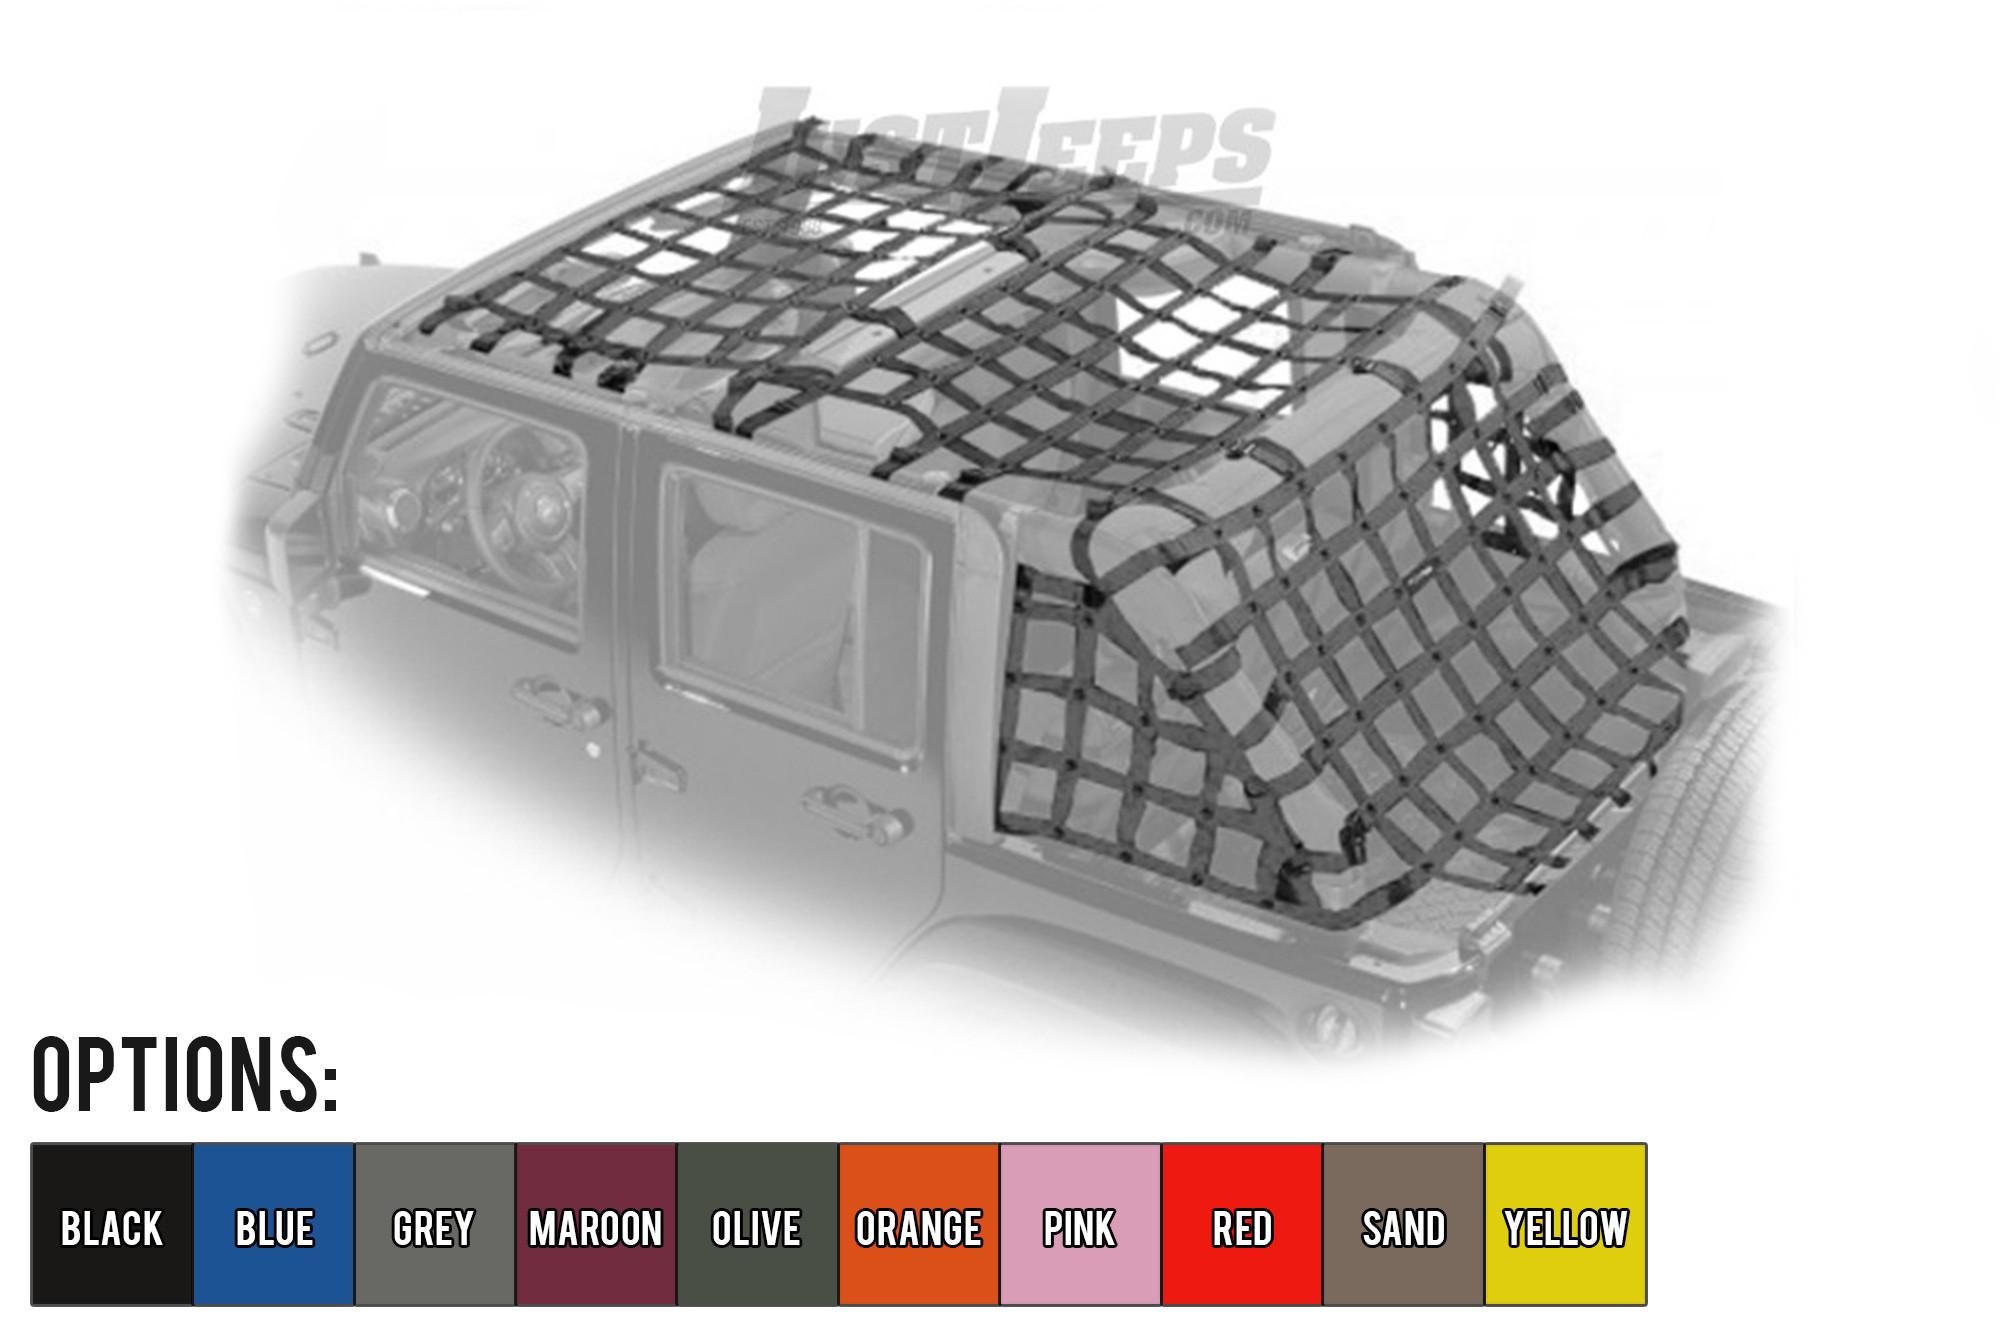 Dirtydog 4X4 Front & Rear Standard Style 5 Piece Netting Kit For 2007-18 Jeep Wrangler JK Unlimited 4 Door Models J4NN07AC-